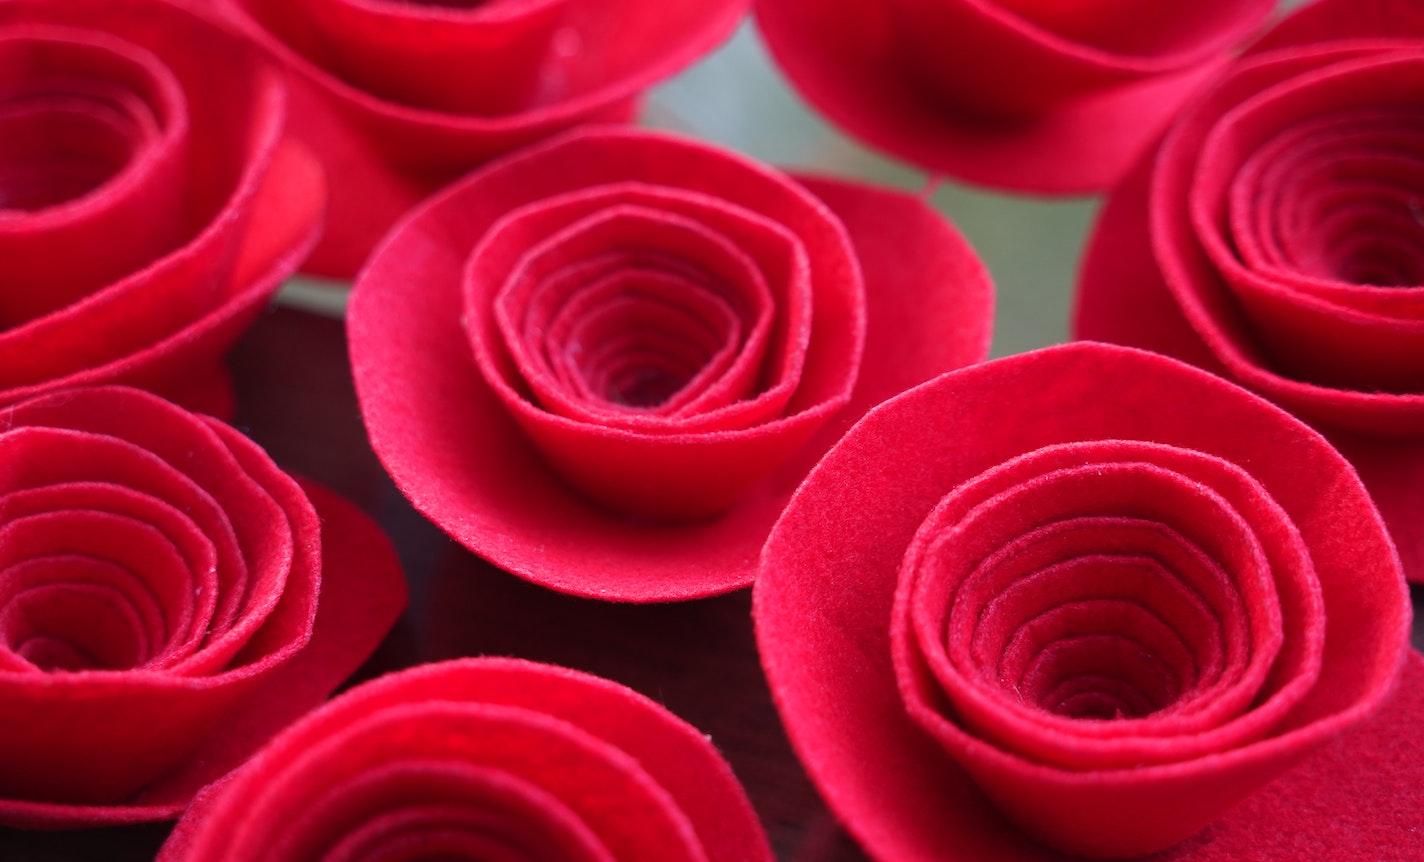 Rose River Memorial: Gather Online to Make Roses